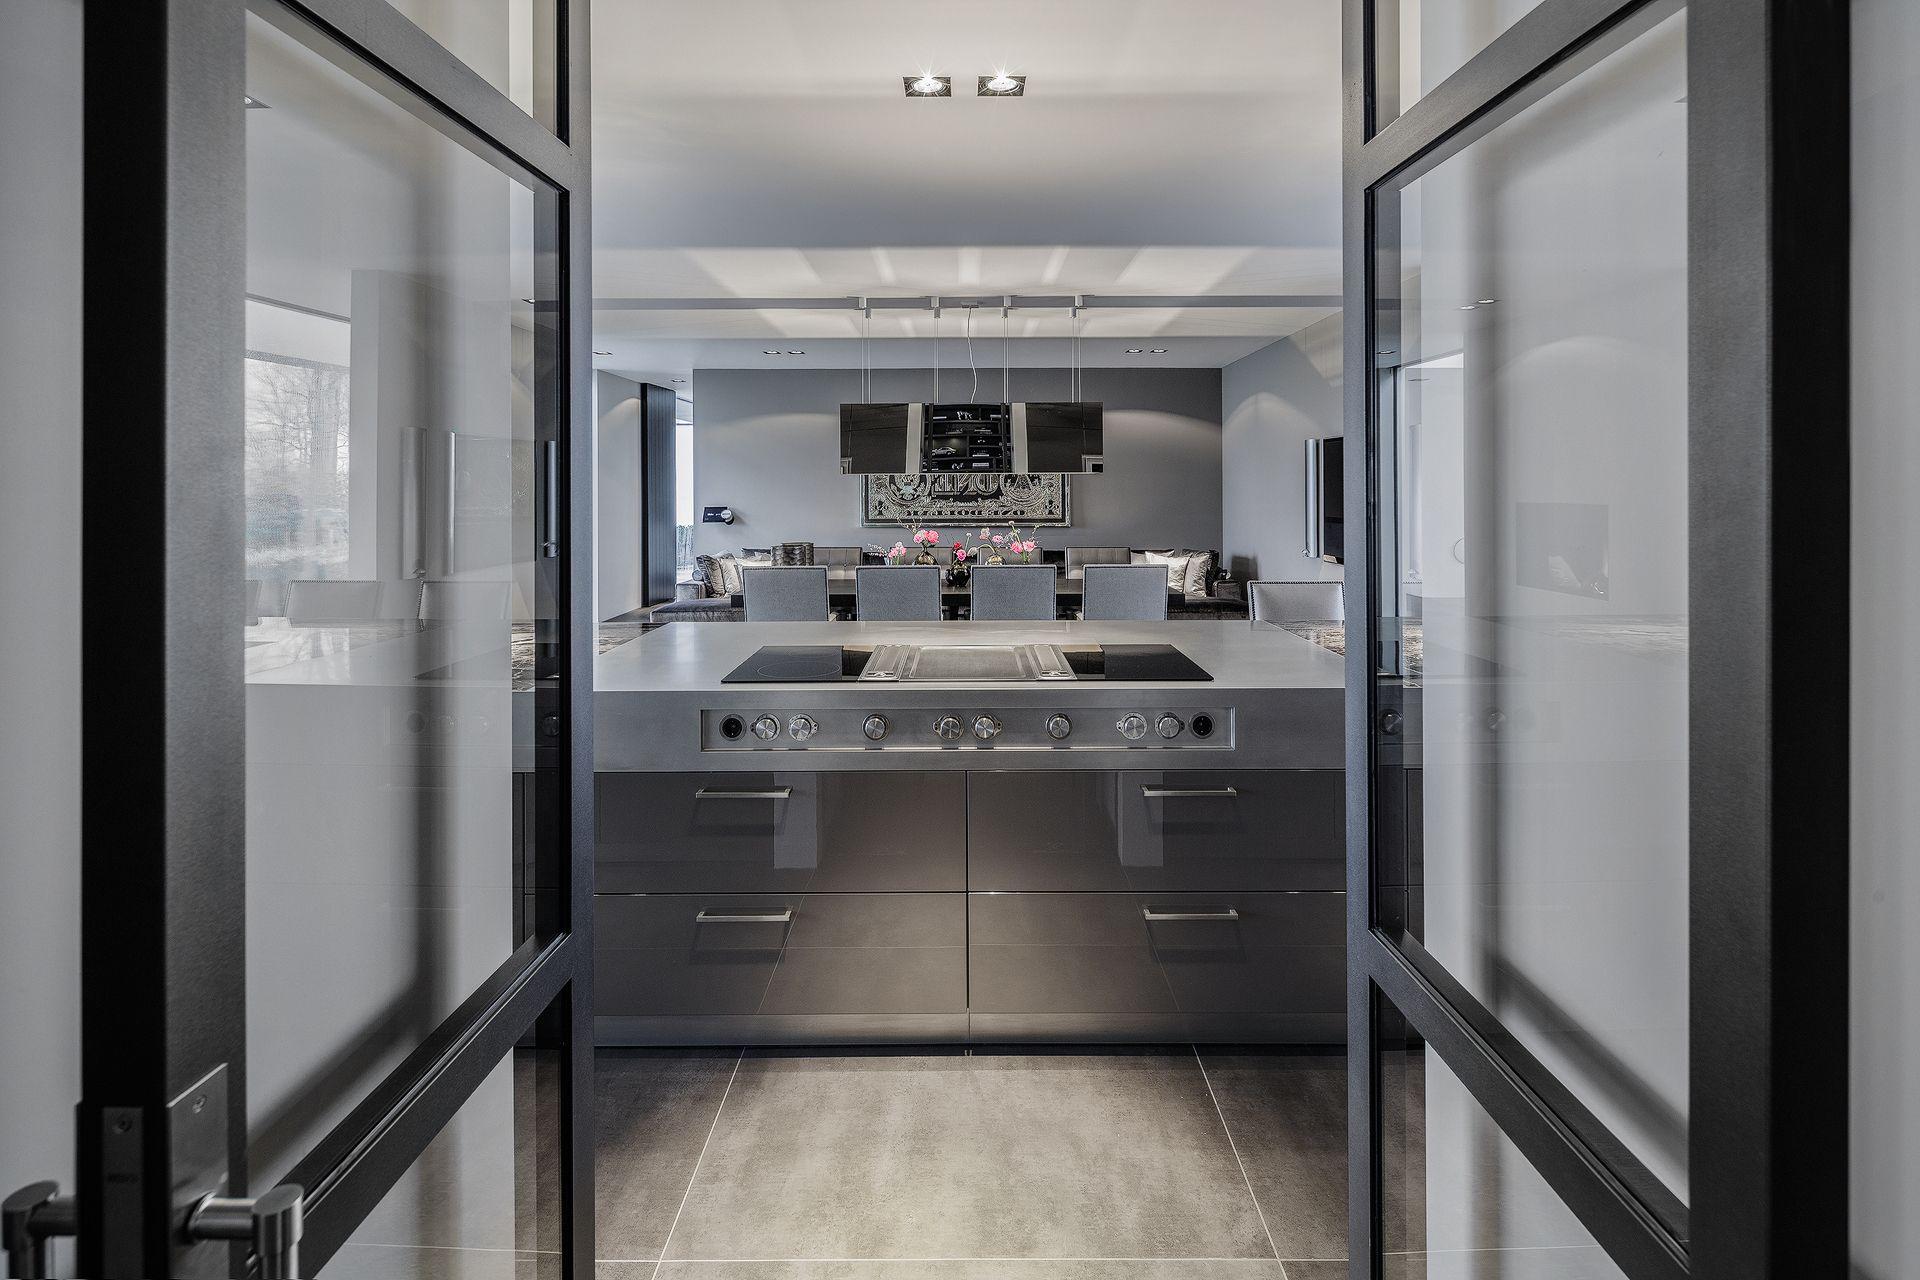 Culimaat high end kitchens interiors italiaanse keukens en